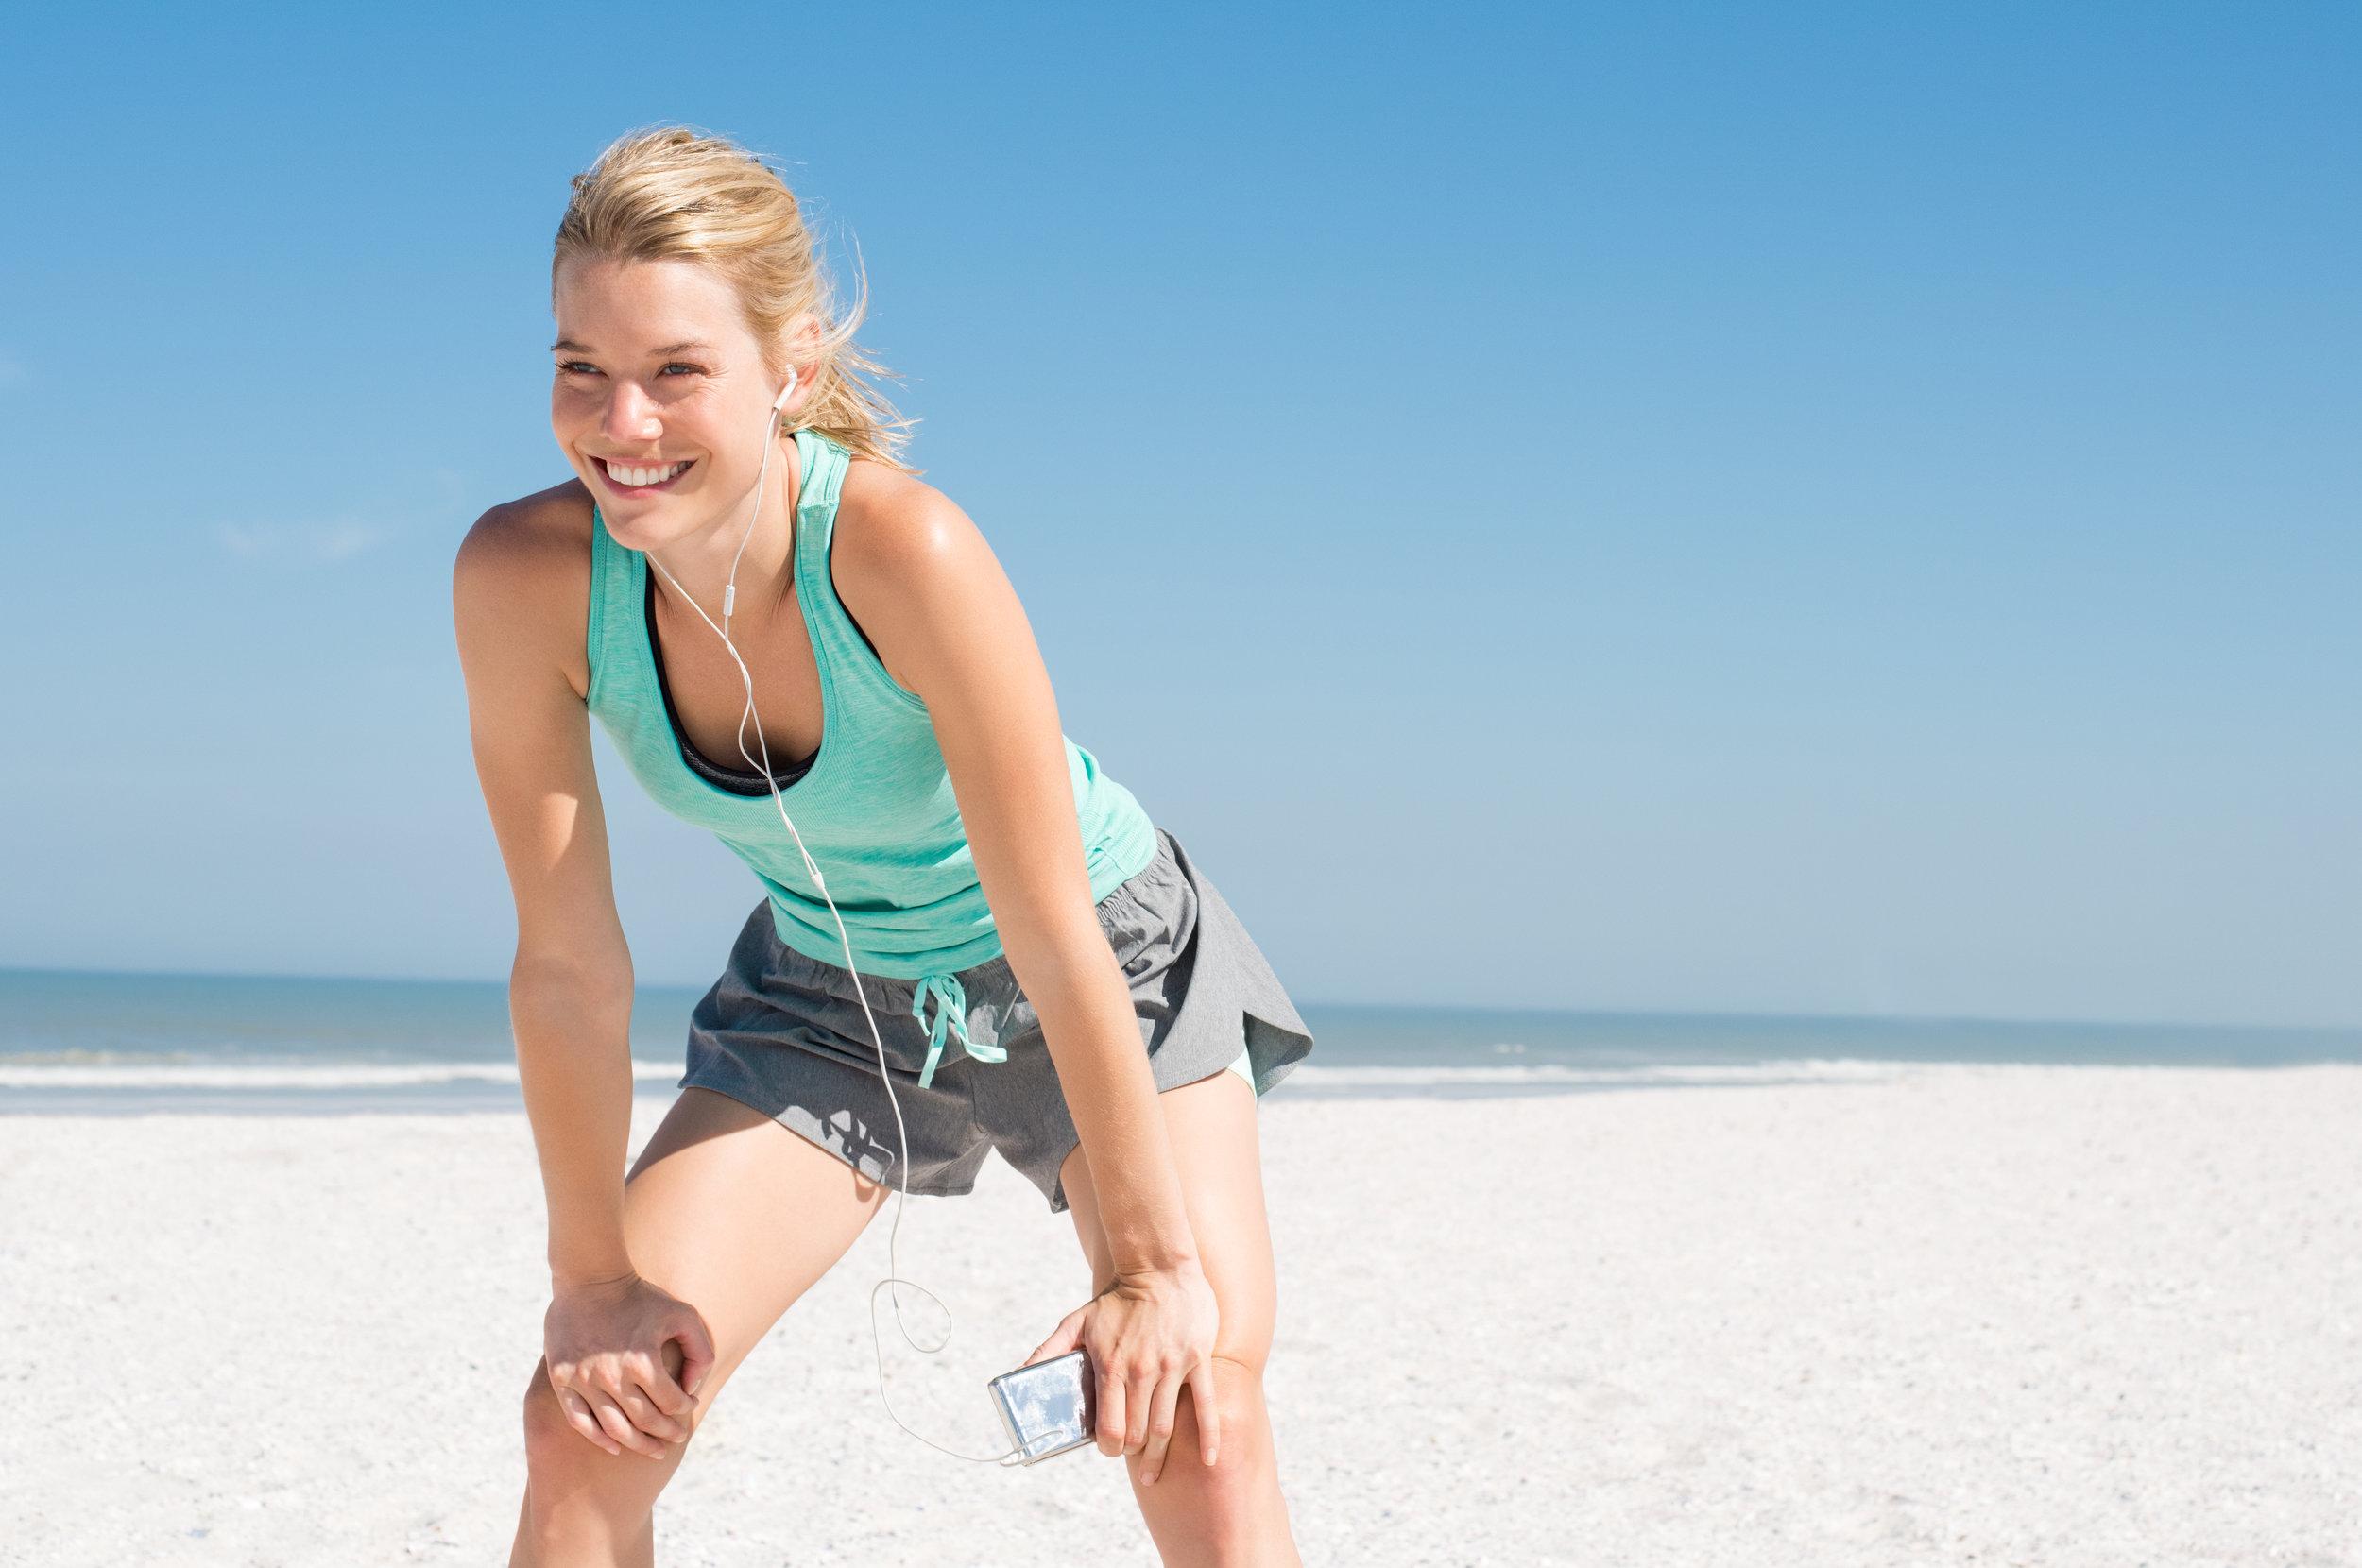 iStock- woman exercising on beach.jpg